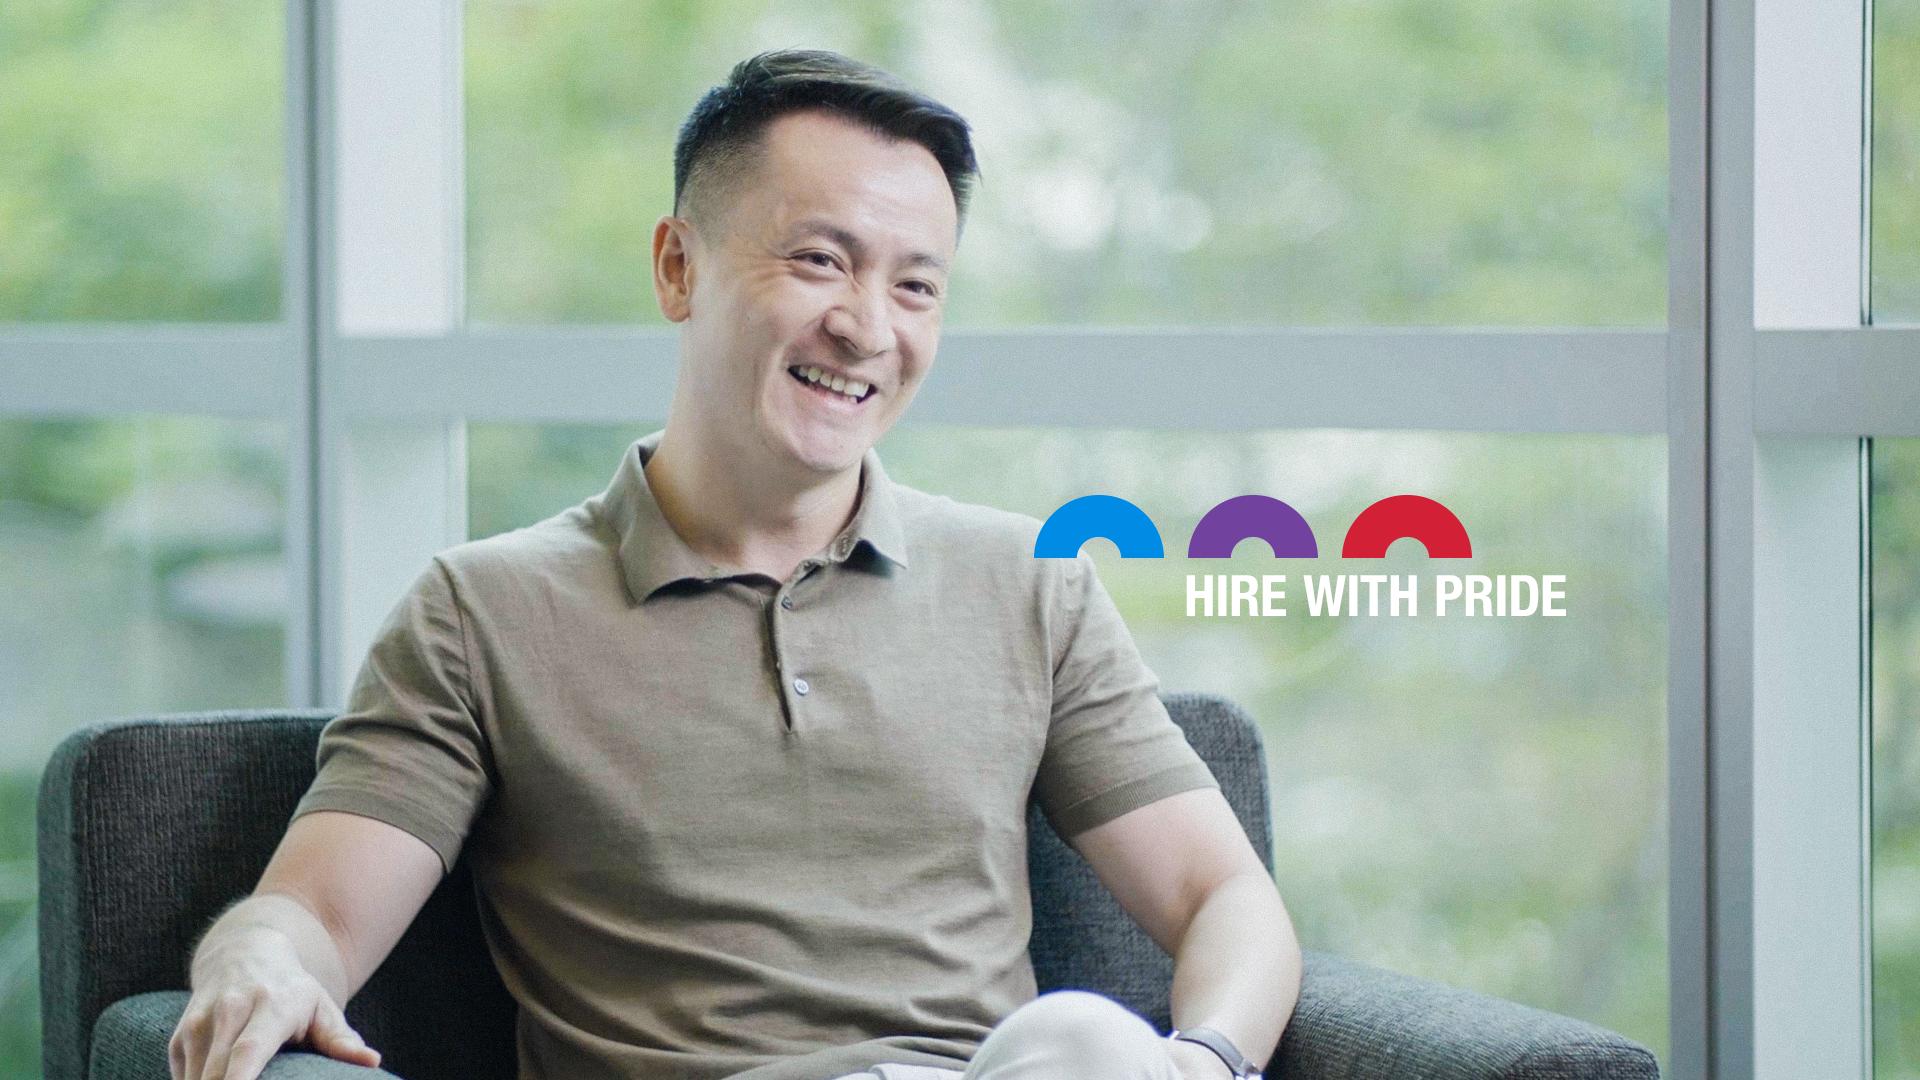 PridePass ↳A platform that tracks all job offers from LGBTQ+ friendly companies.